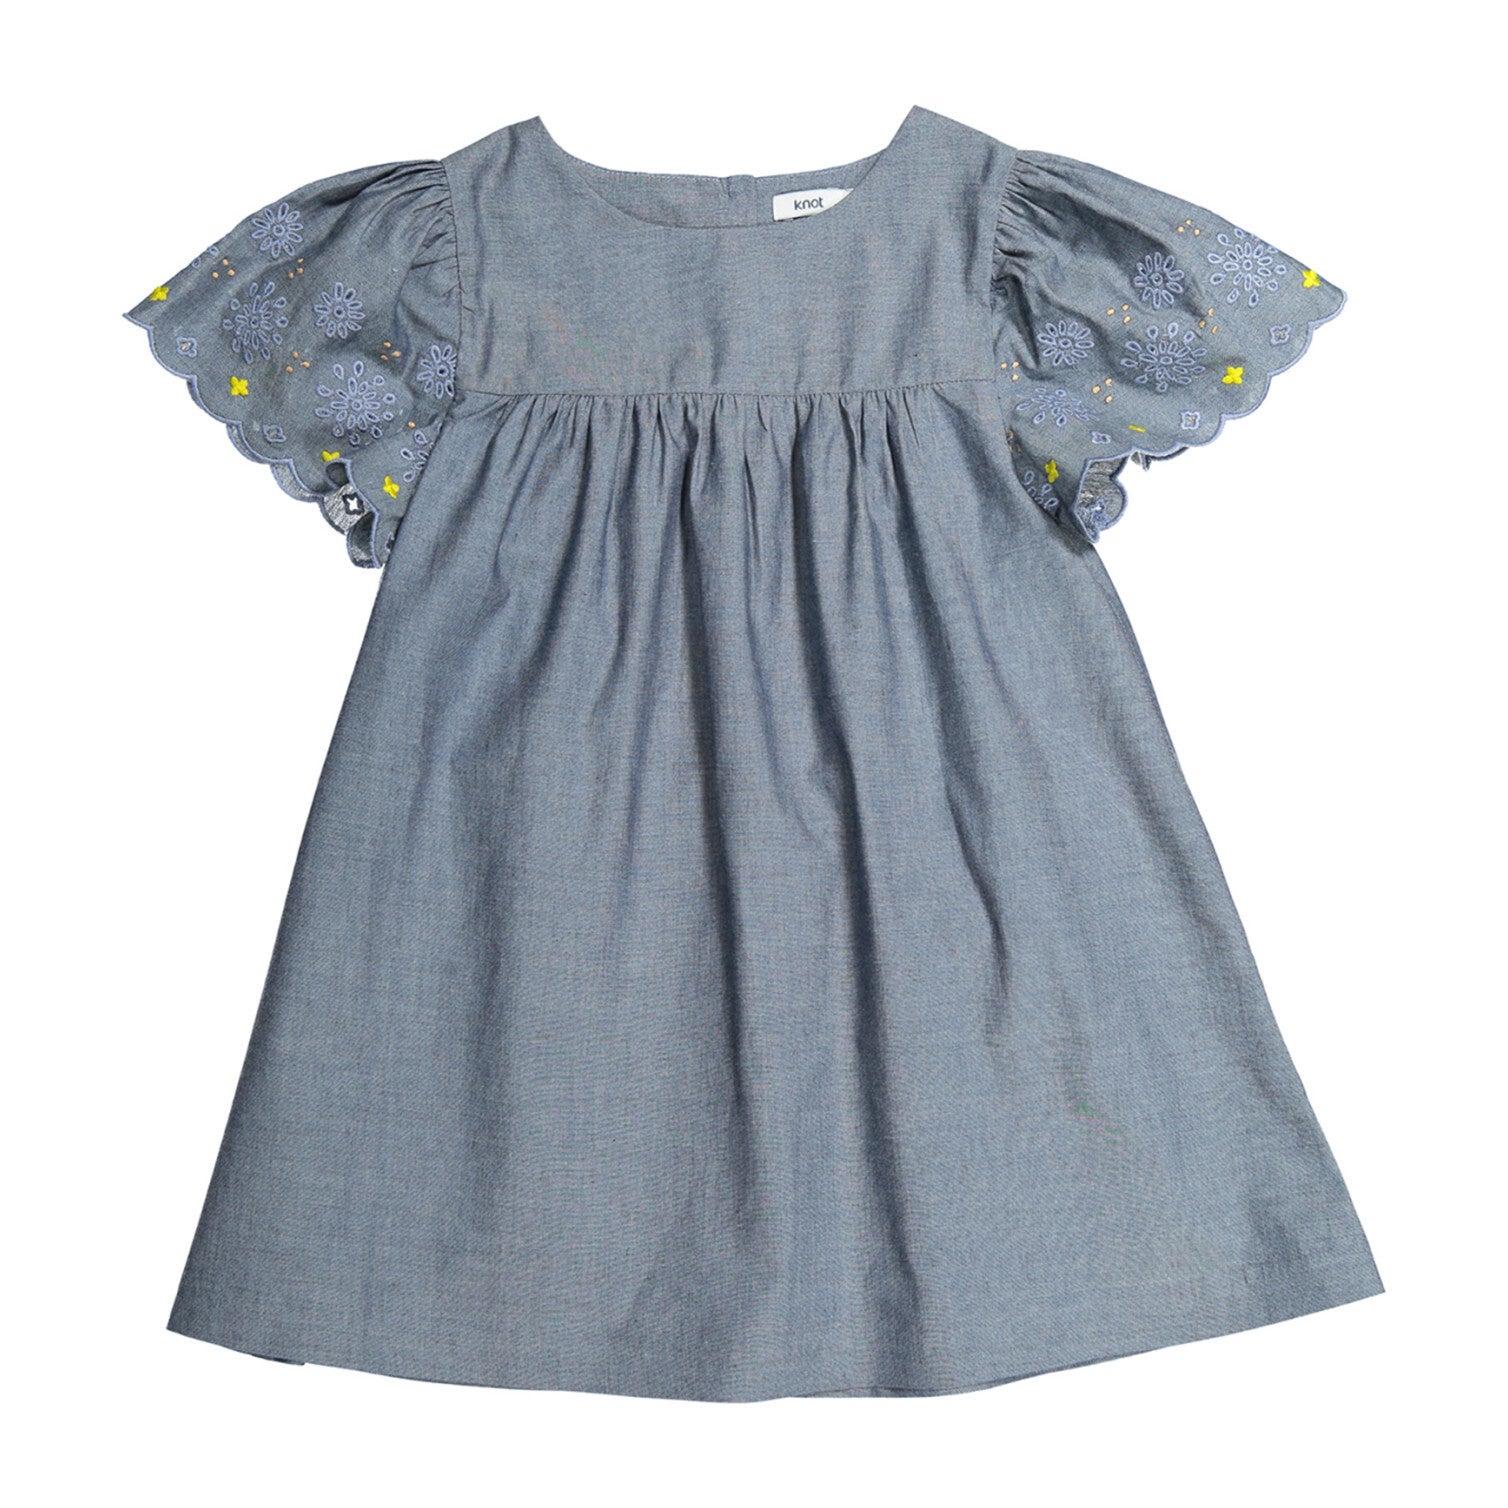 Embroidered Chambray Dress, Medium Denim